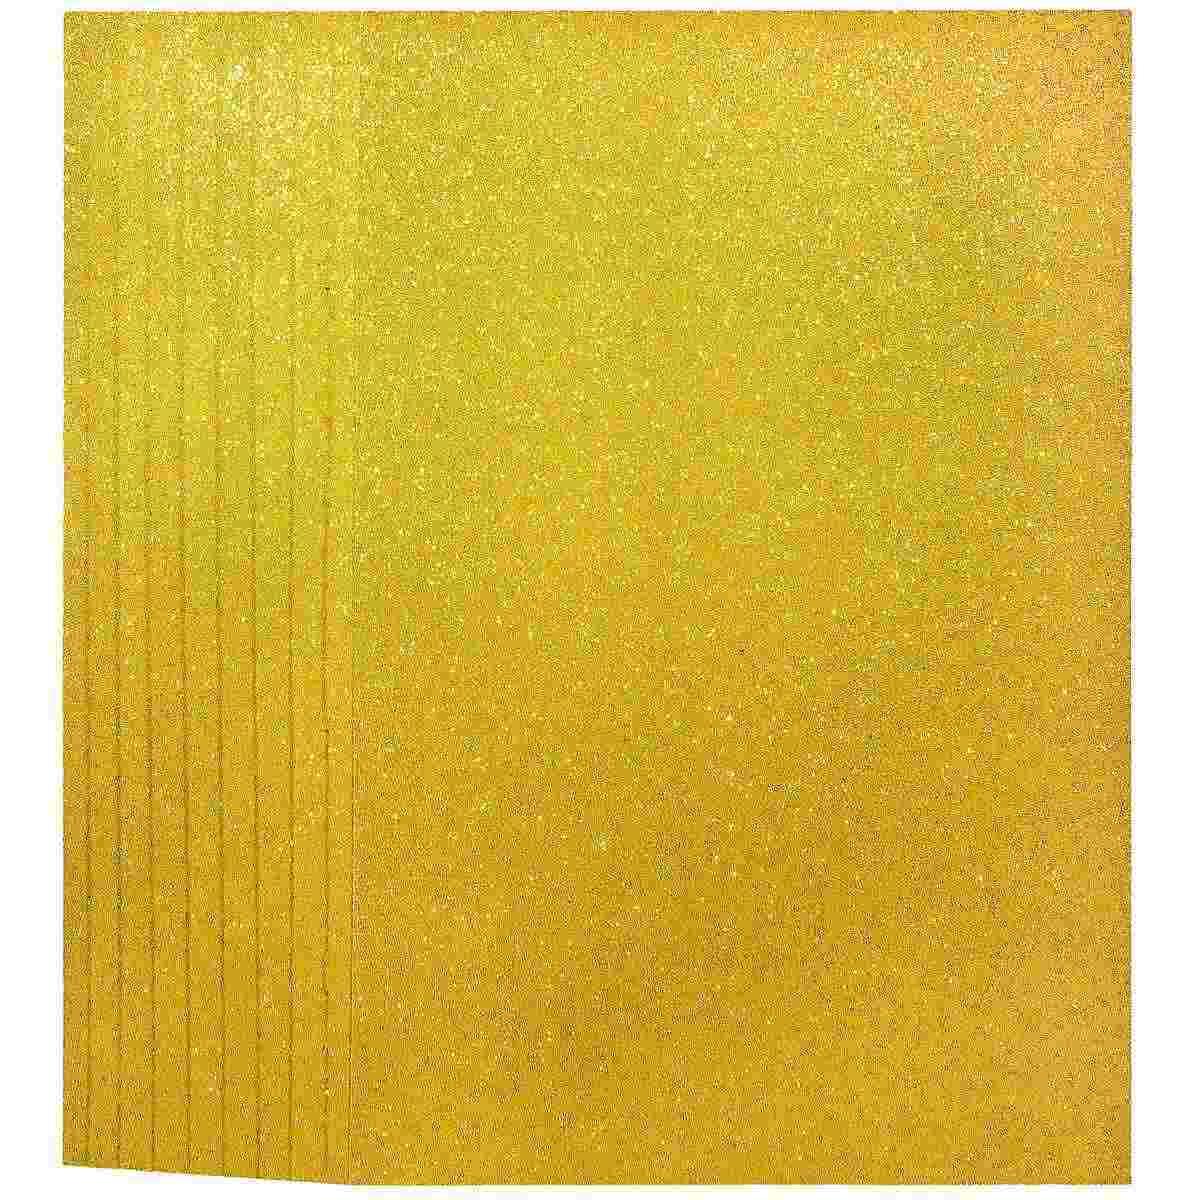 Glitter Foam A3 Sheet Without Sticker Gold